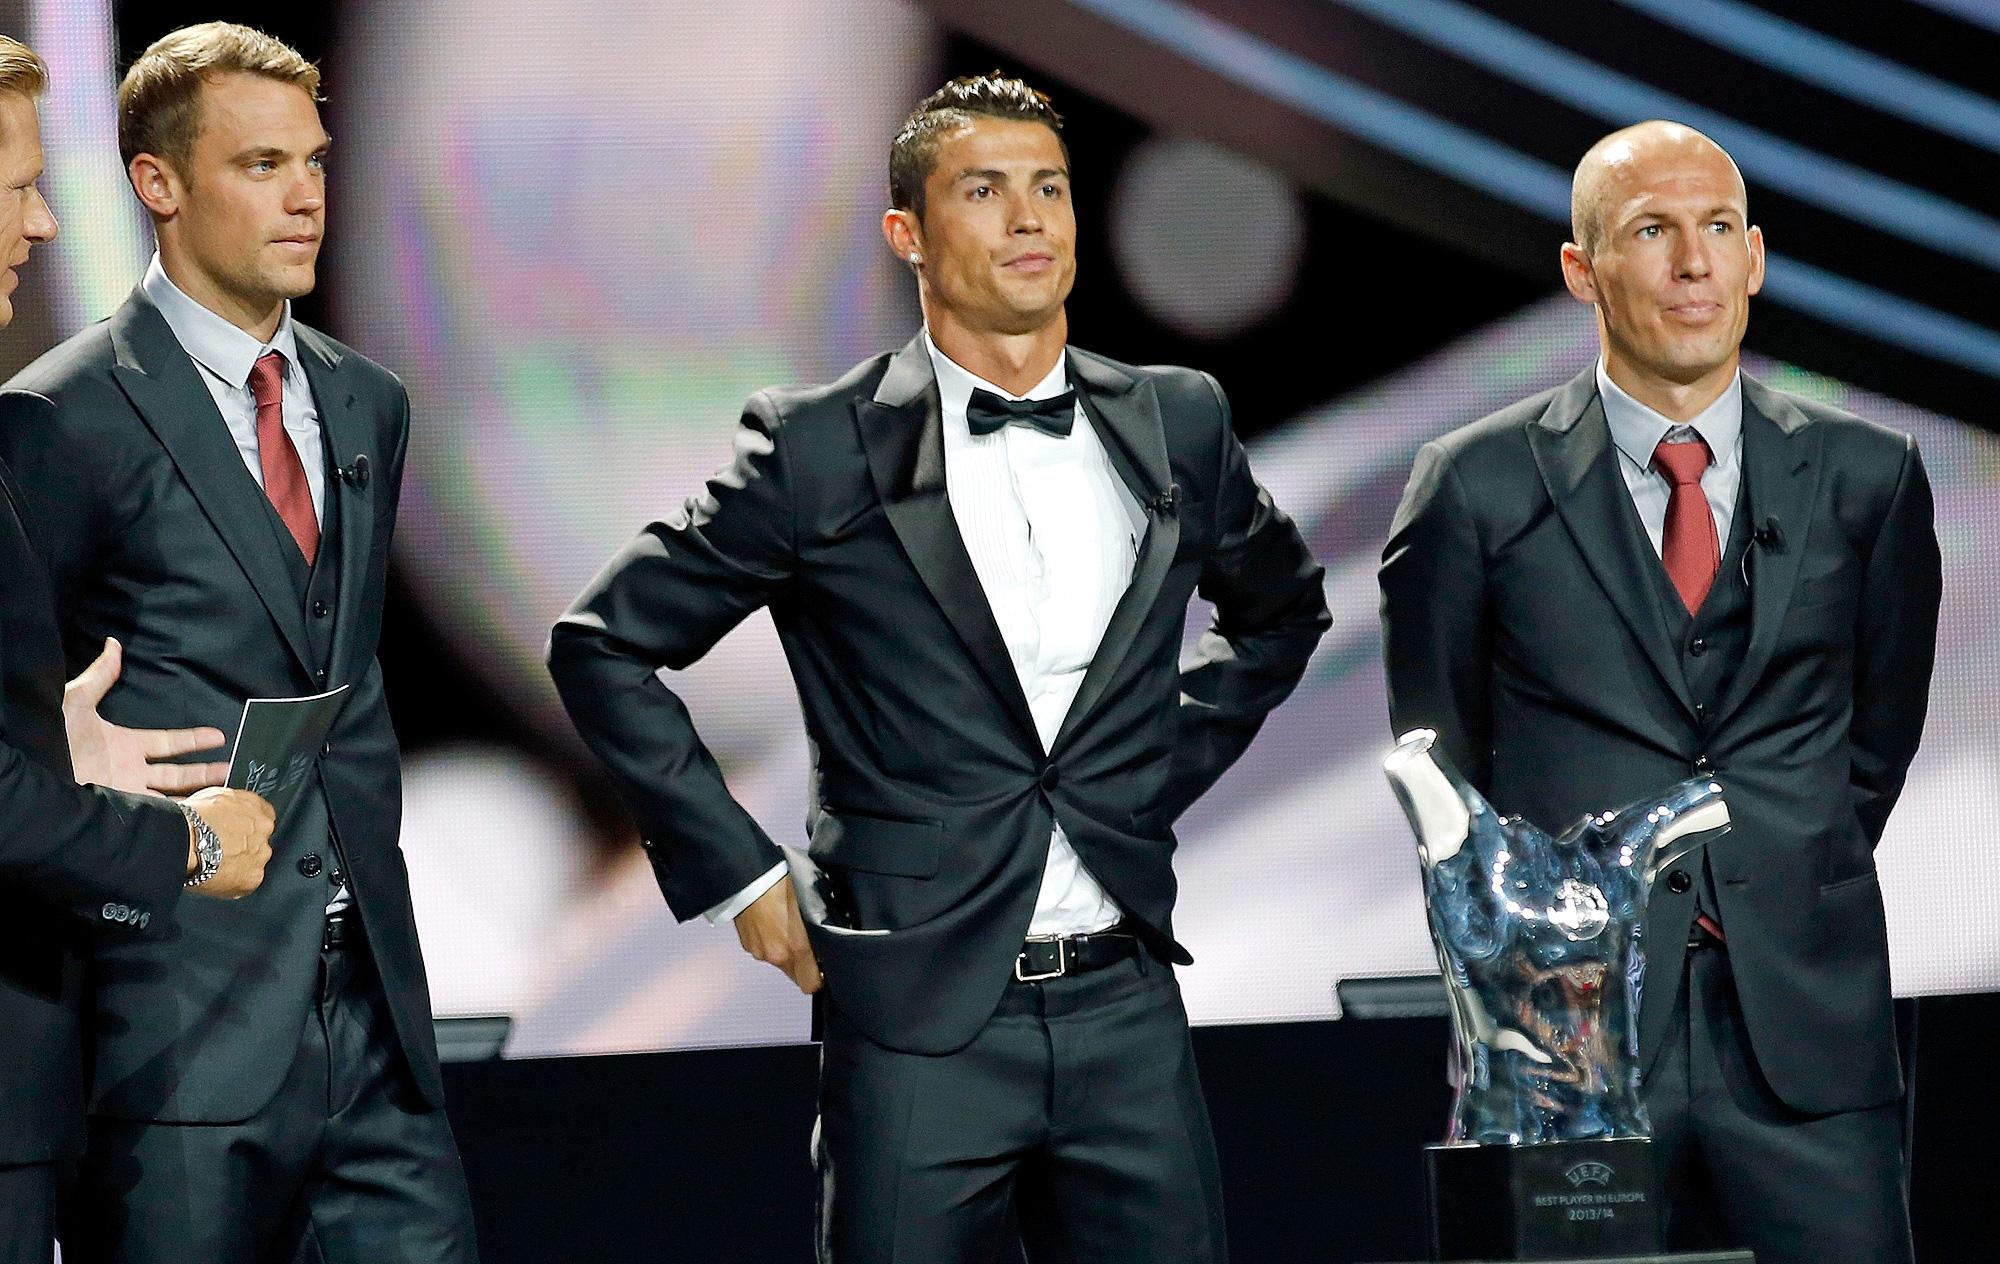 De Smoking Cristiano Ronaldo Rouba A Cena Ao Lado De